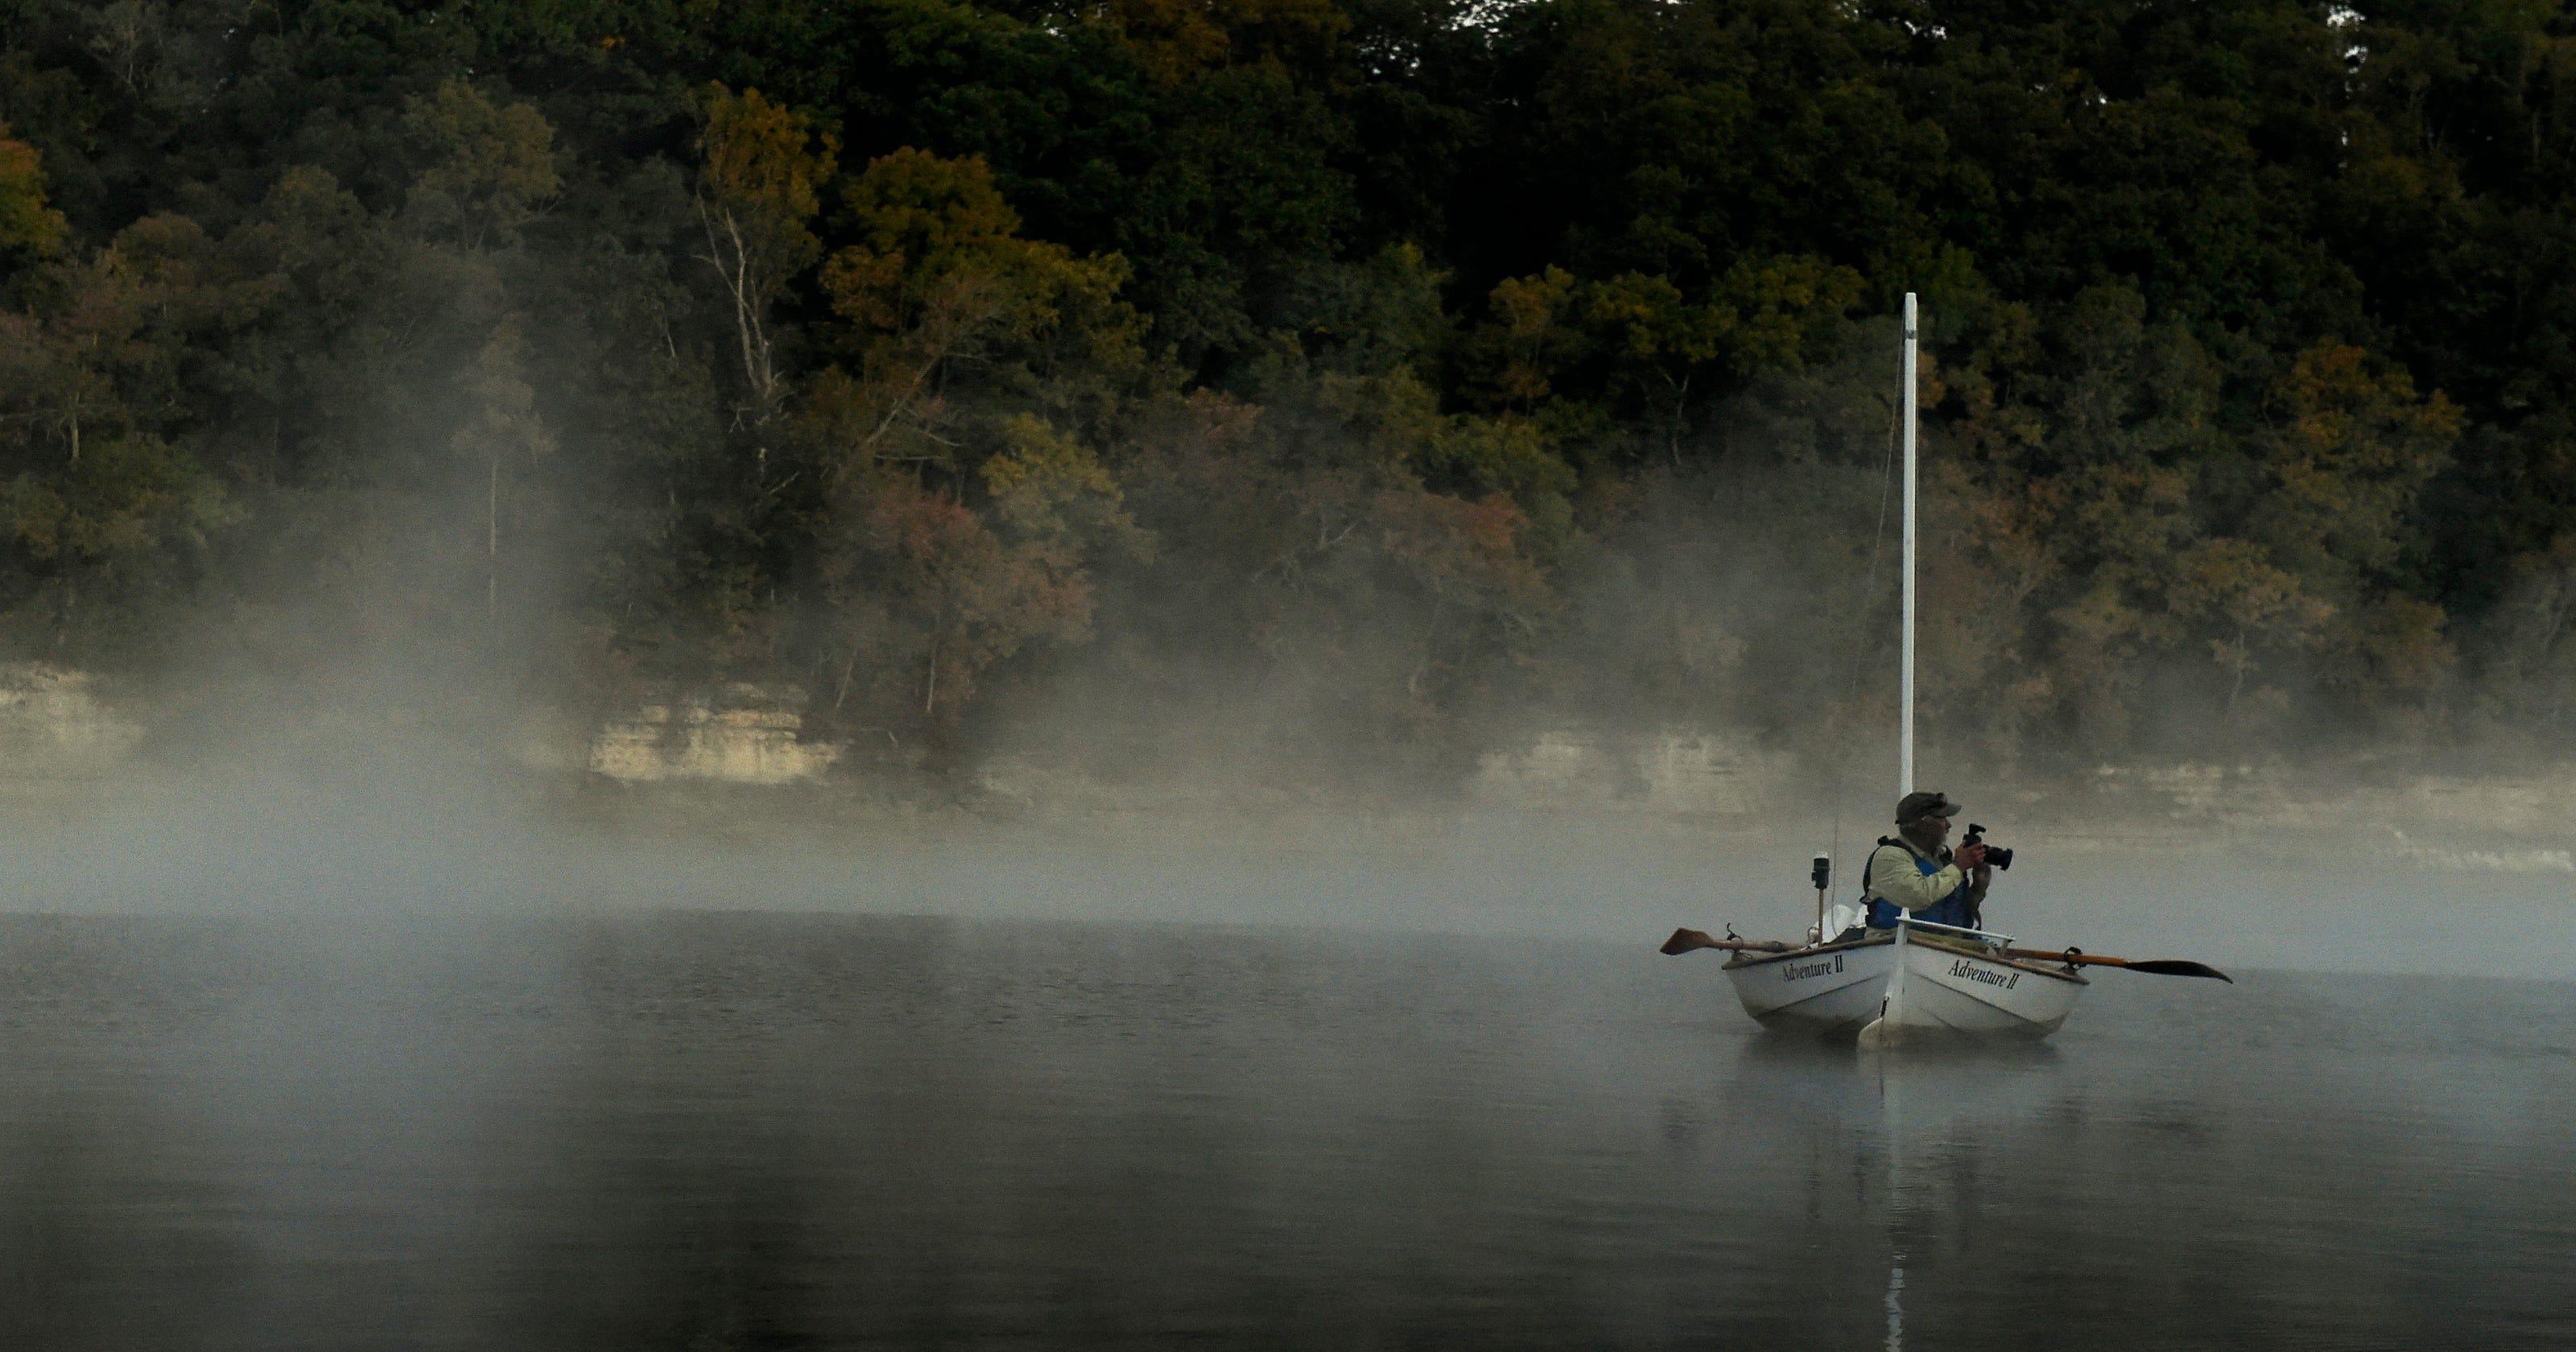 Nashville adventurer retraces John Donelson's historic river journey